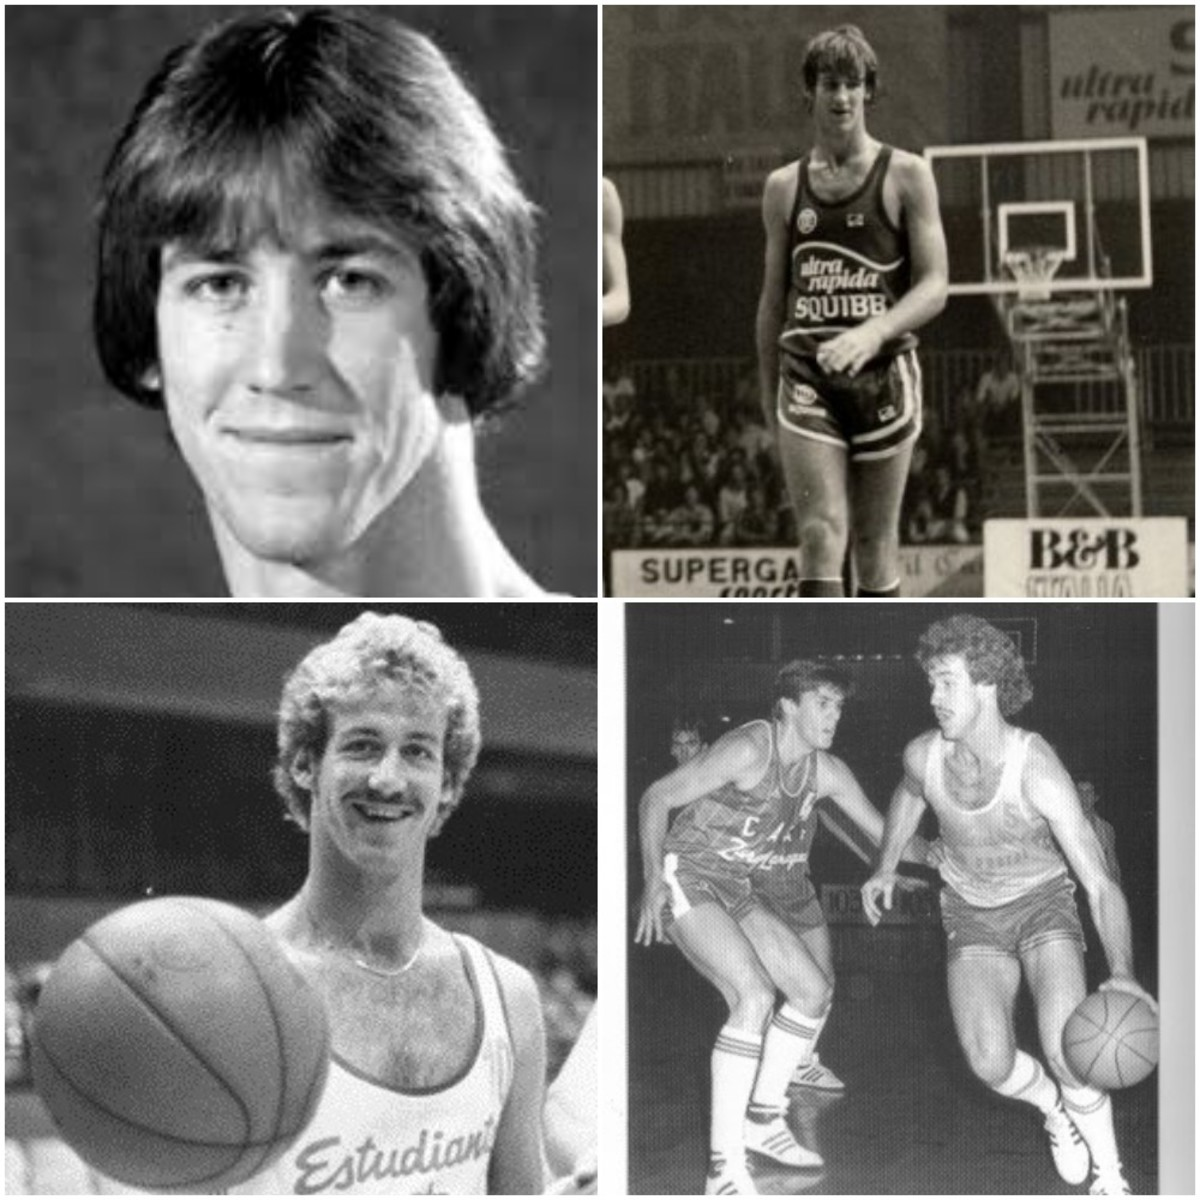 Terry Stotts (Portland Trail Blazers)